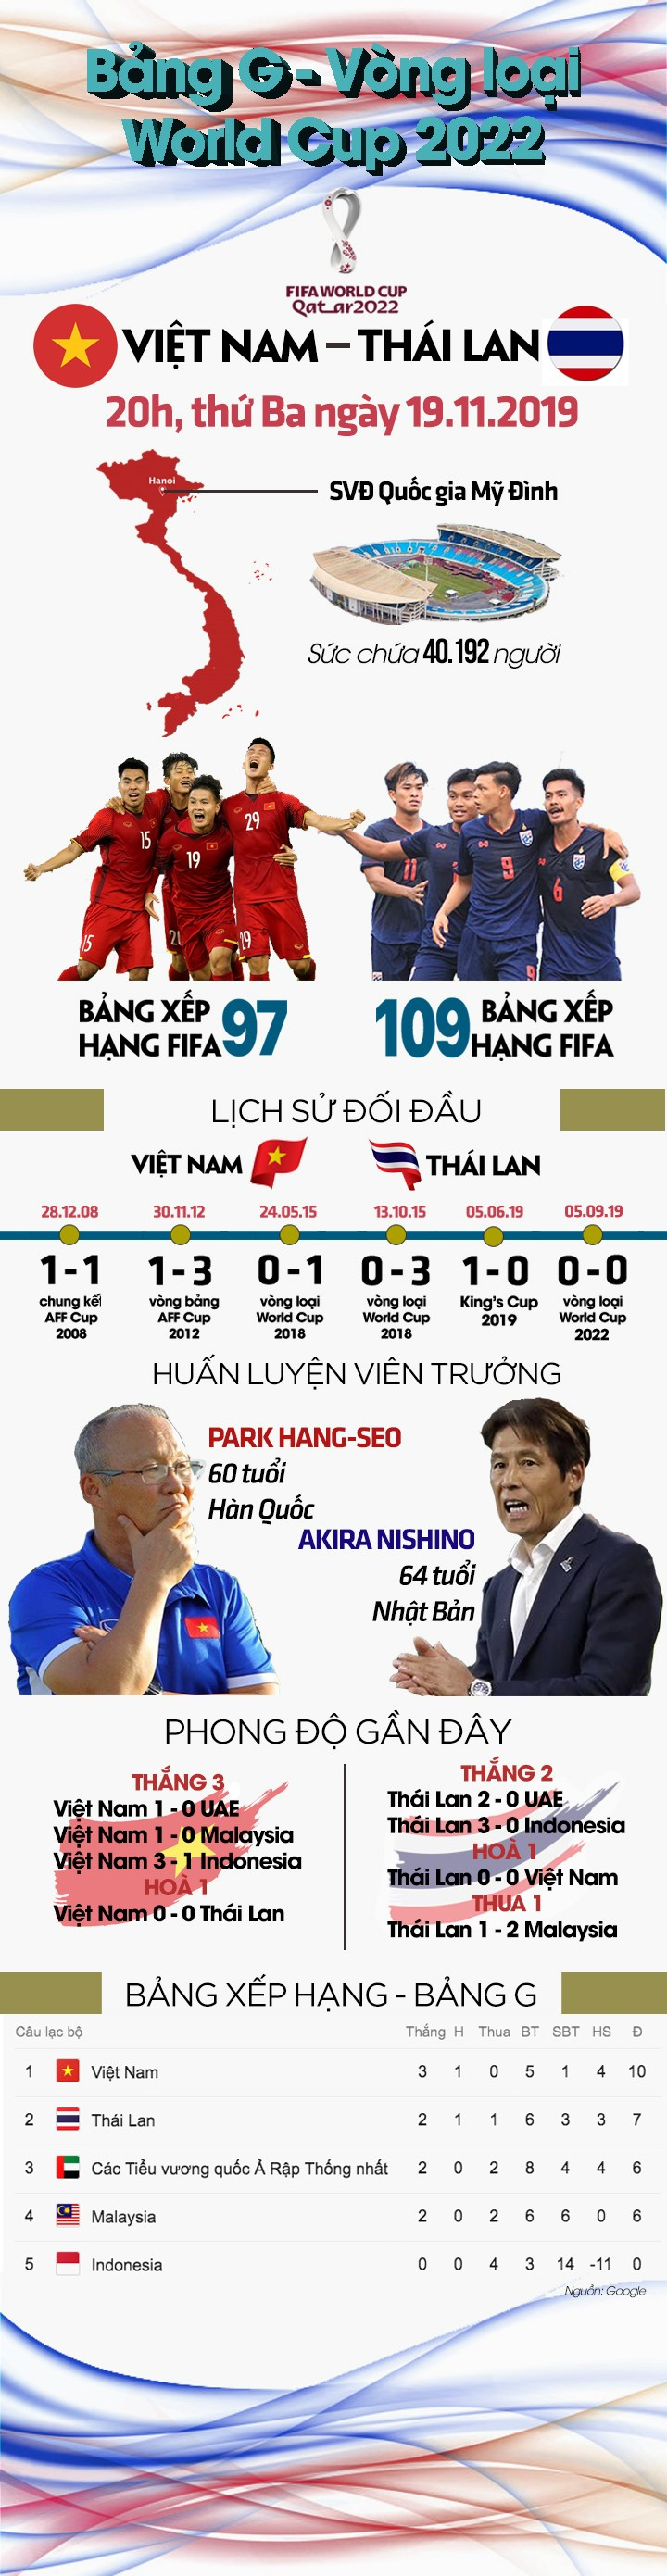 Nhung dieu can biet truoc tran ''dai chien'' Viet Nam - Thai Lan hinh anh 1